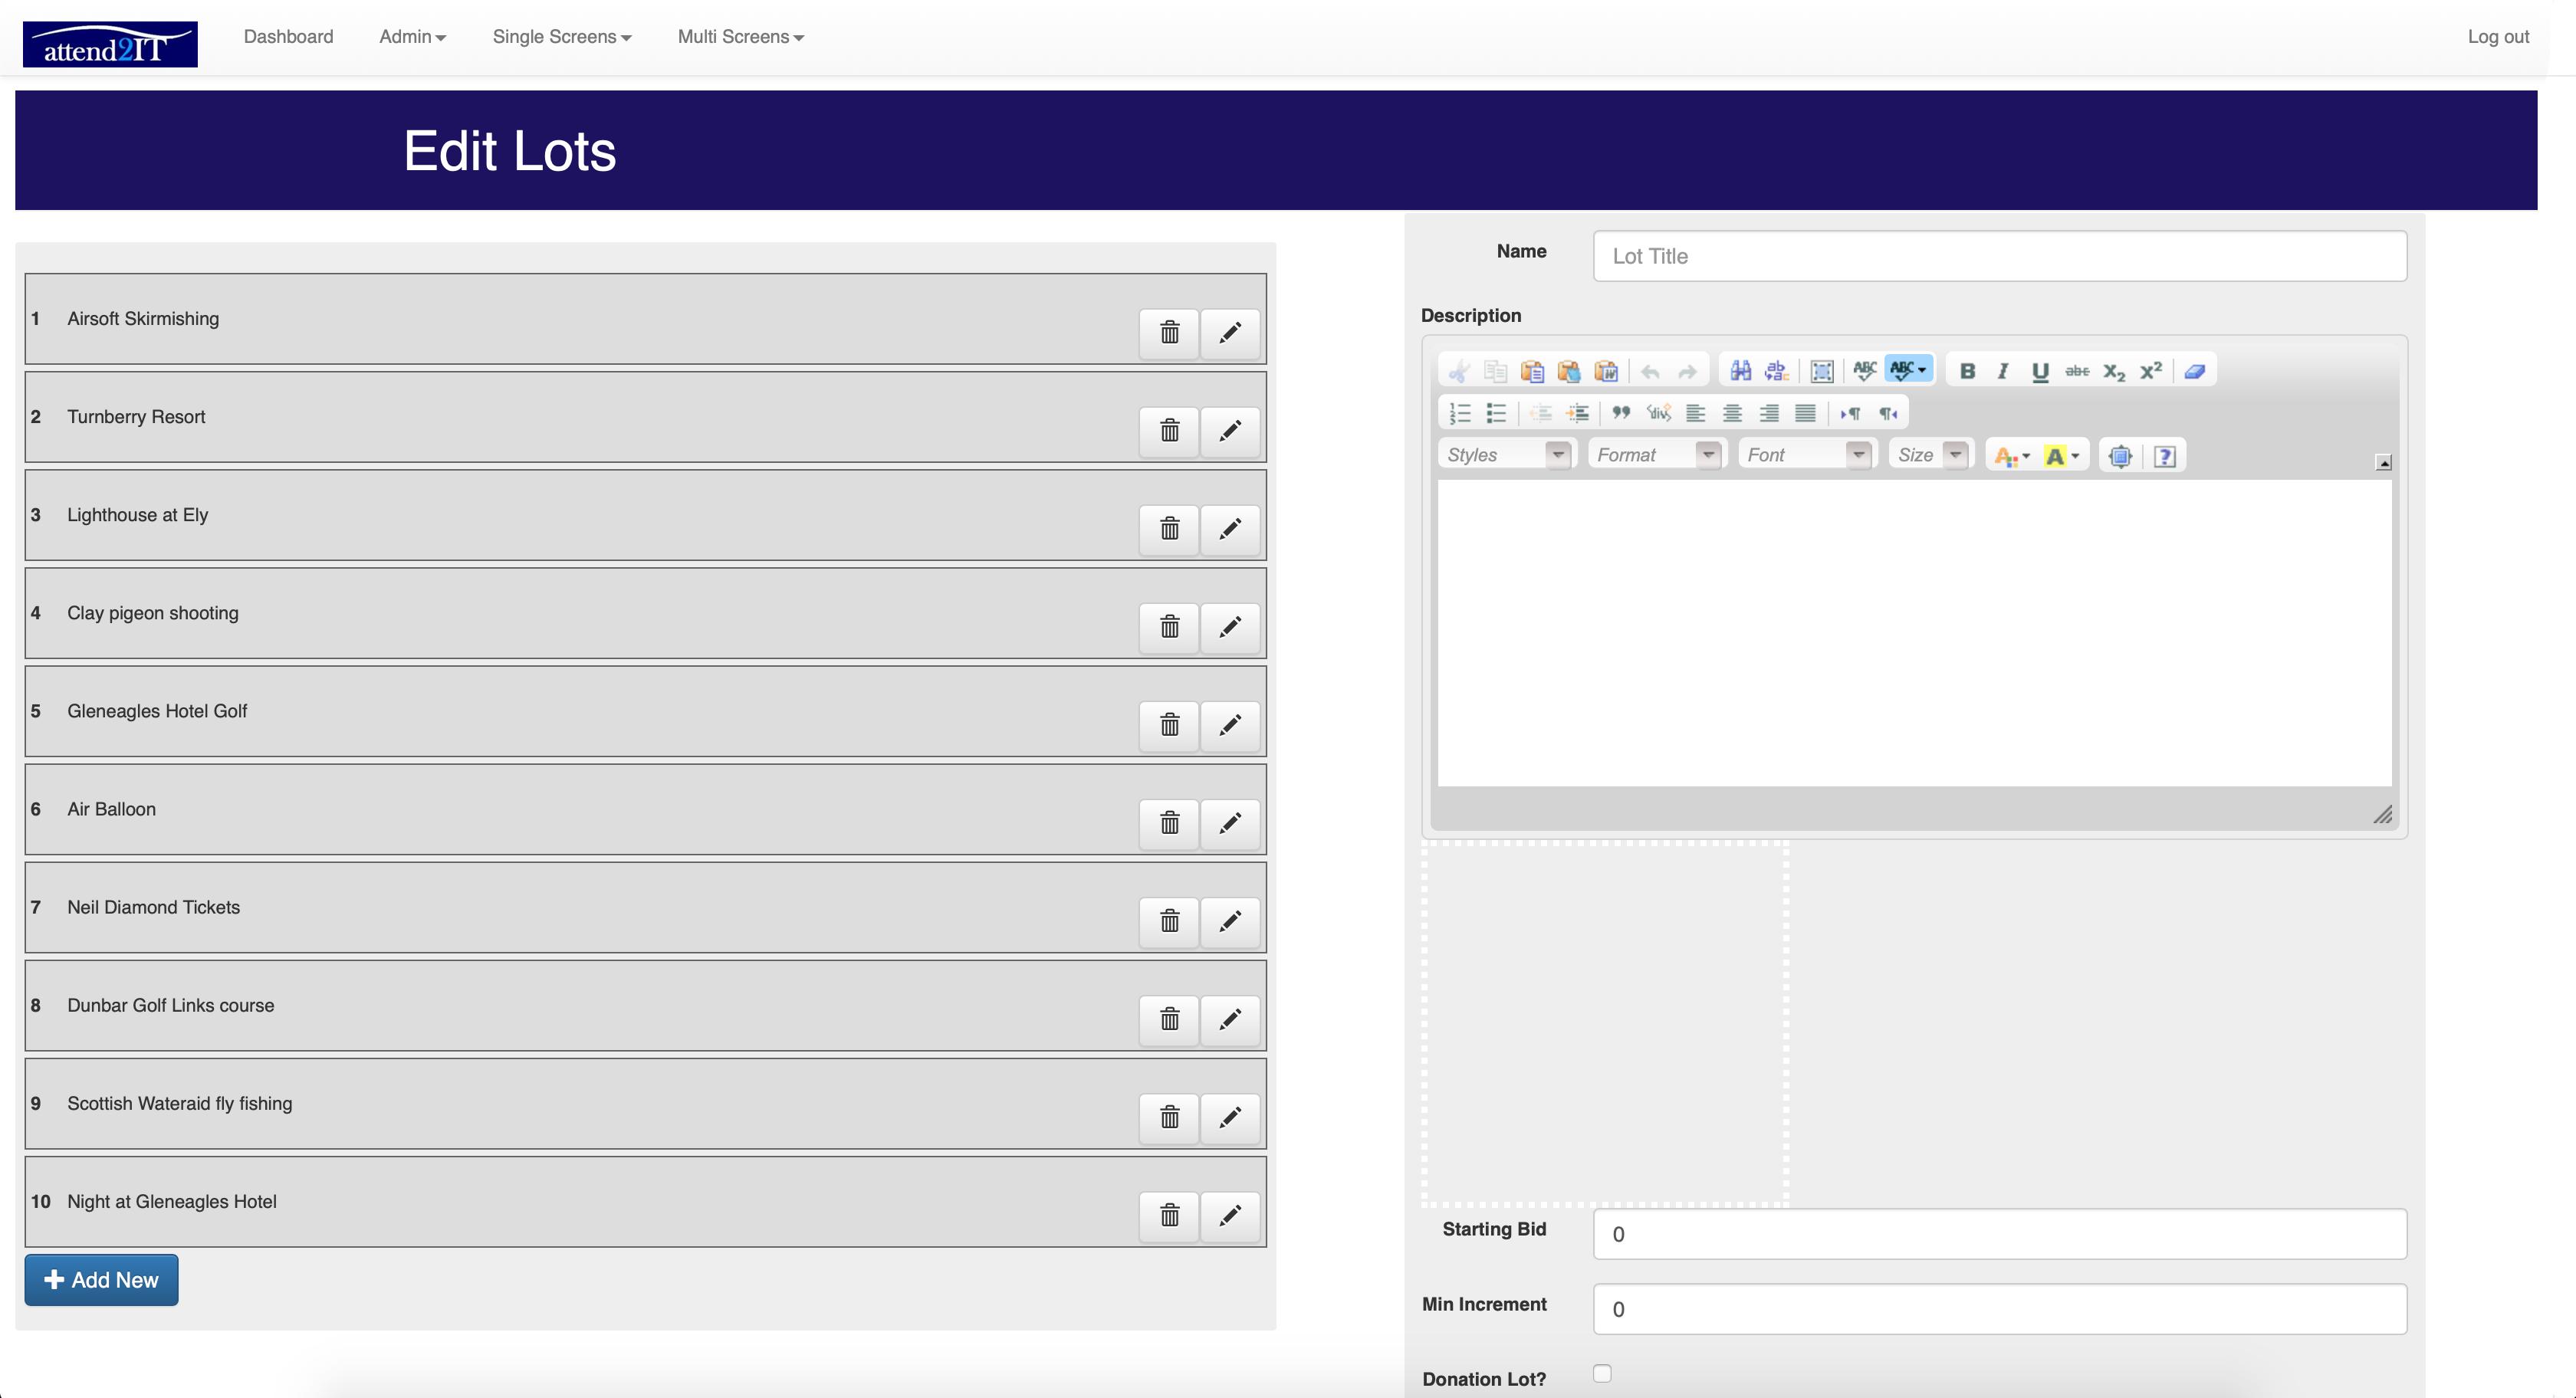 EditLotsScreenshot